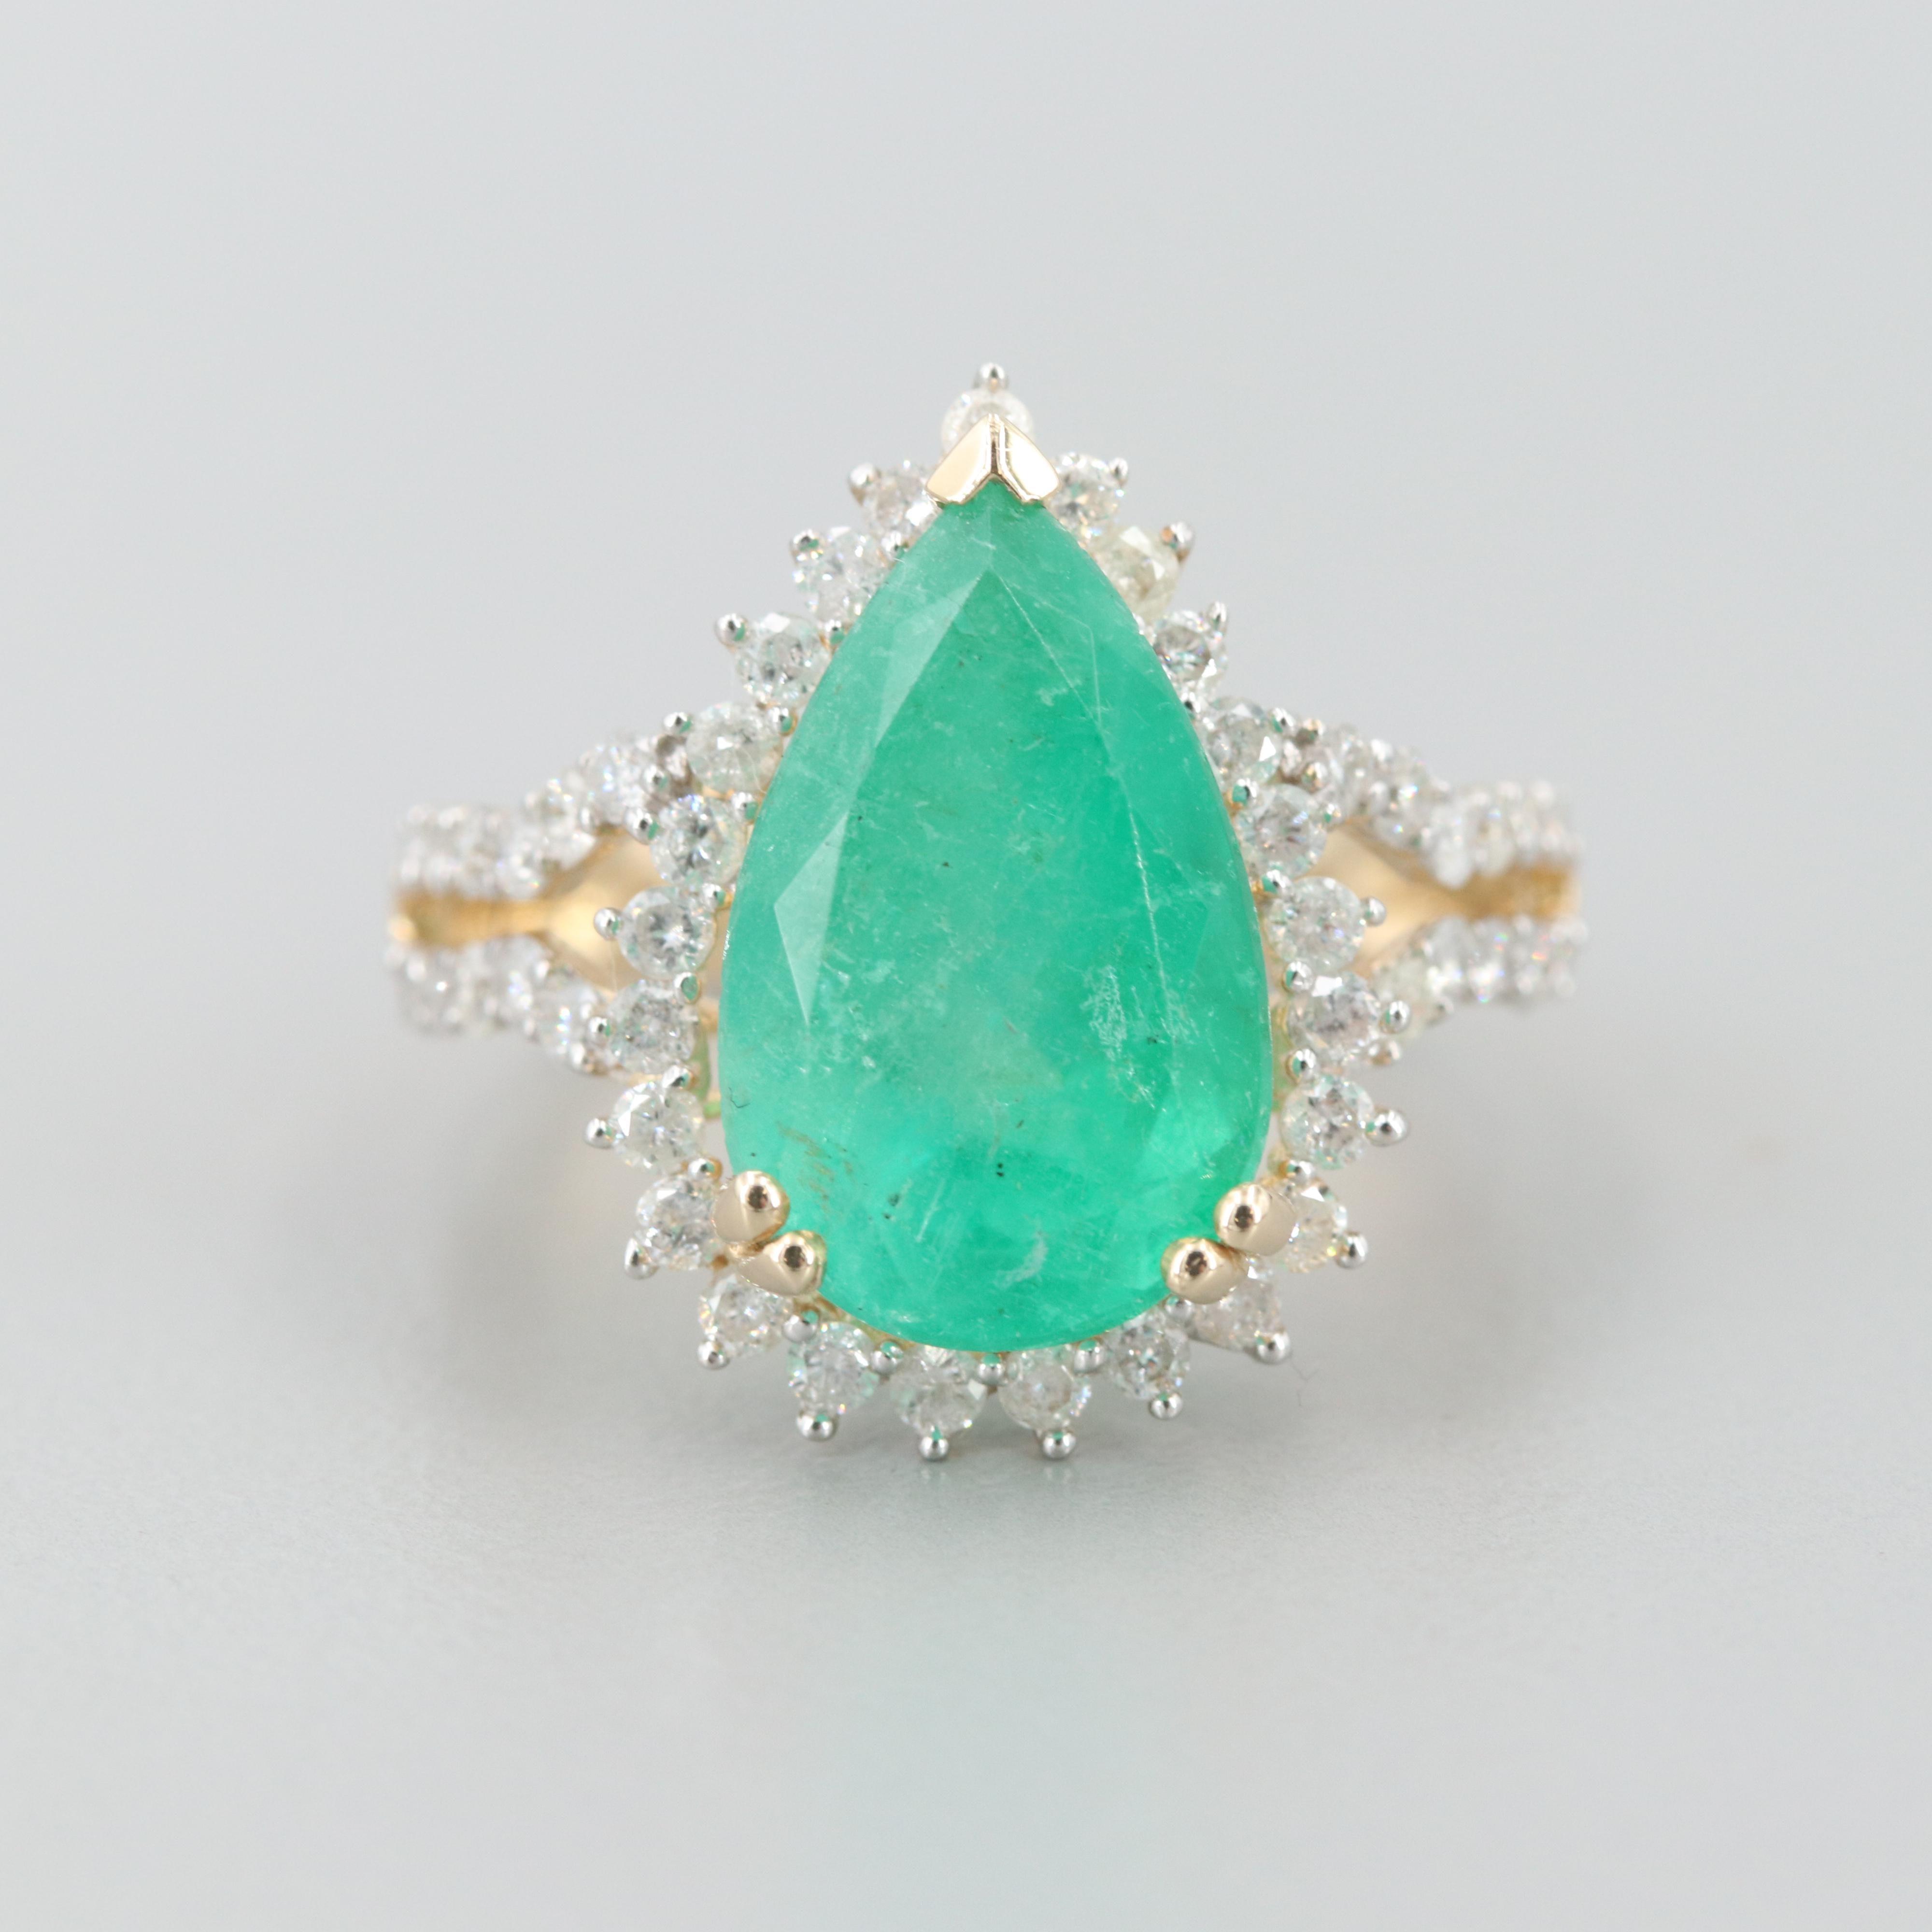 14K Yellow Gold 5.79 CT Emerald and Diamond Ring